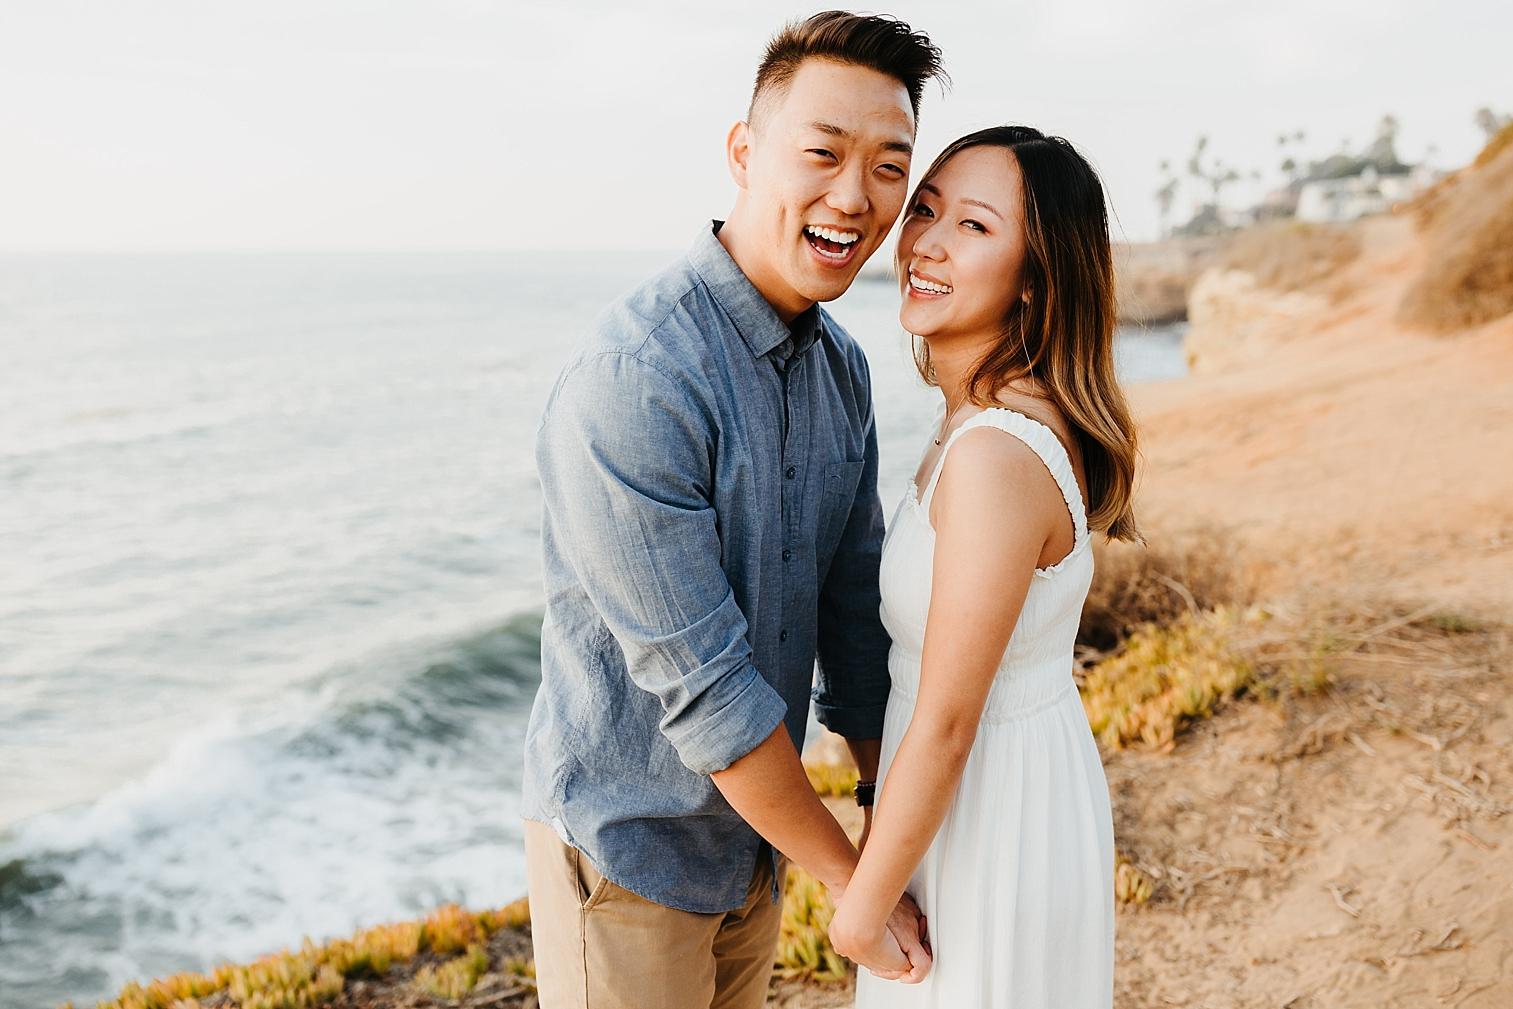 San-Diego-Ocean-Beach-Engagement-Session-32.jpg